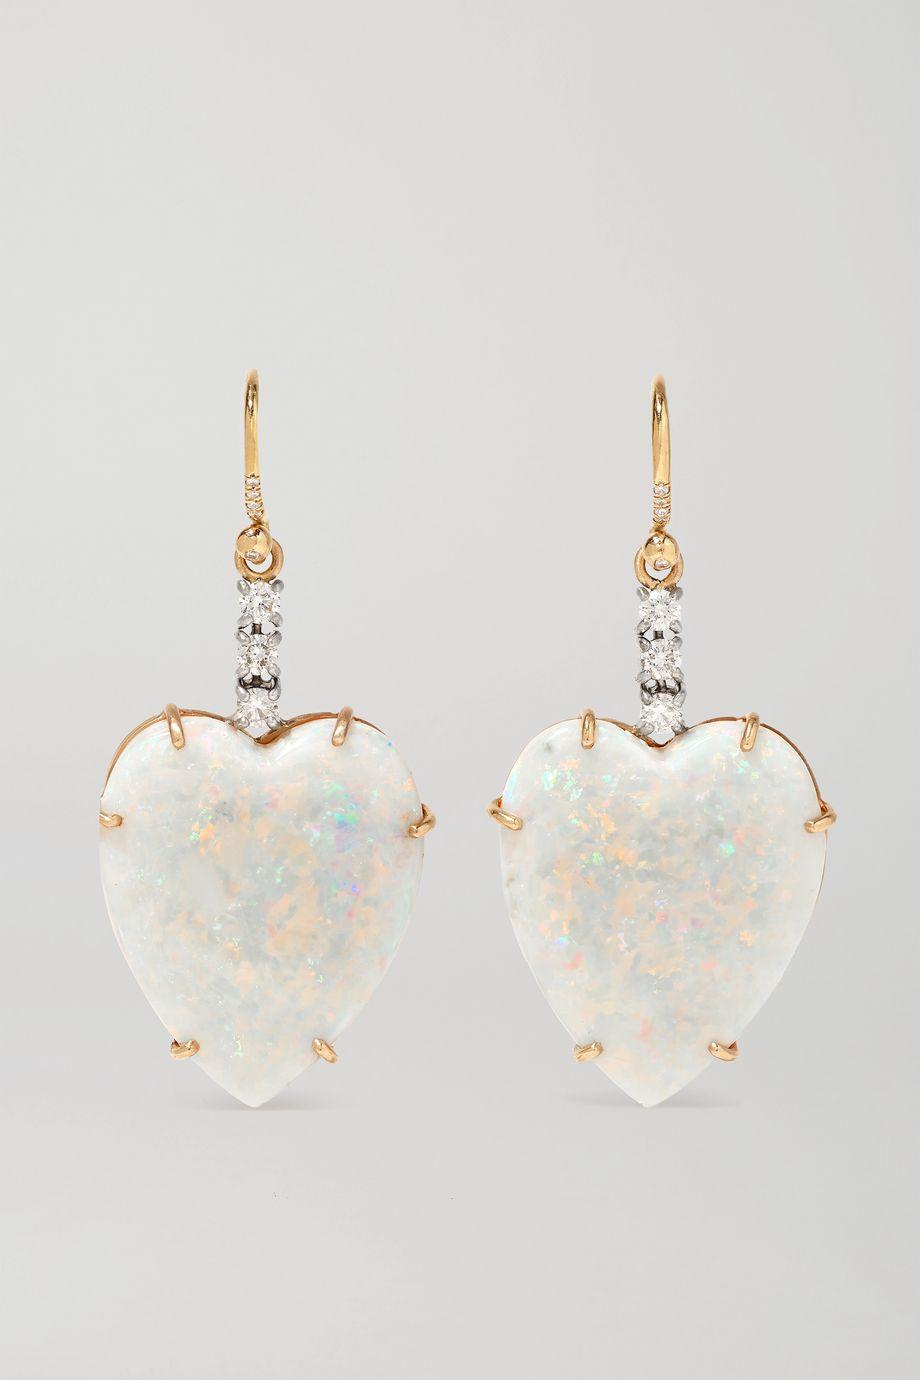 Irene Neuwirth Love 18-karat rose and white gold, opal and diamond earrings